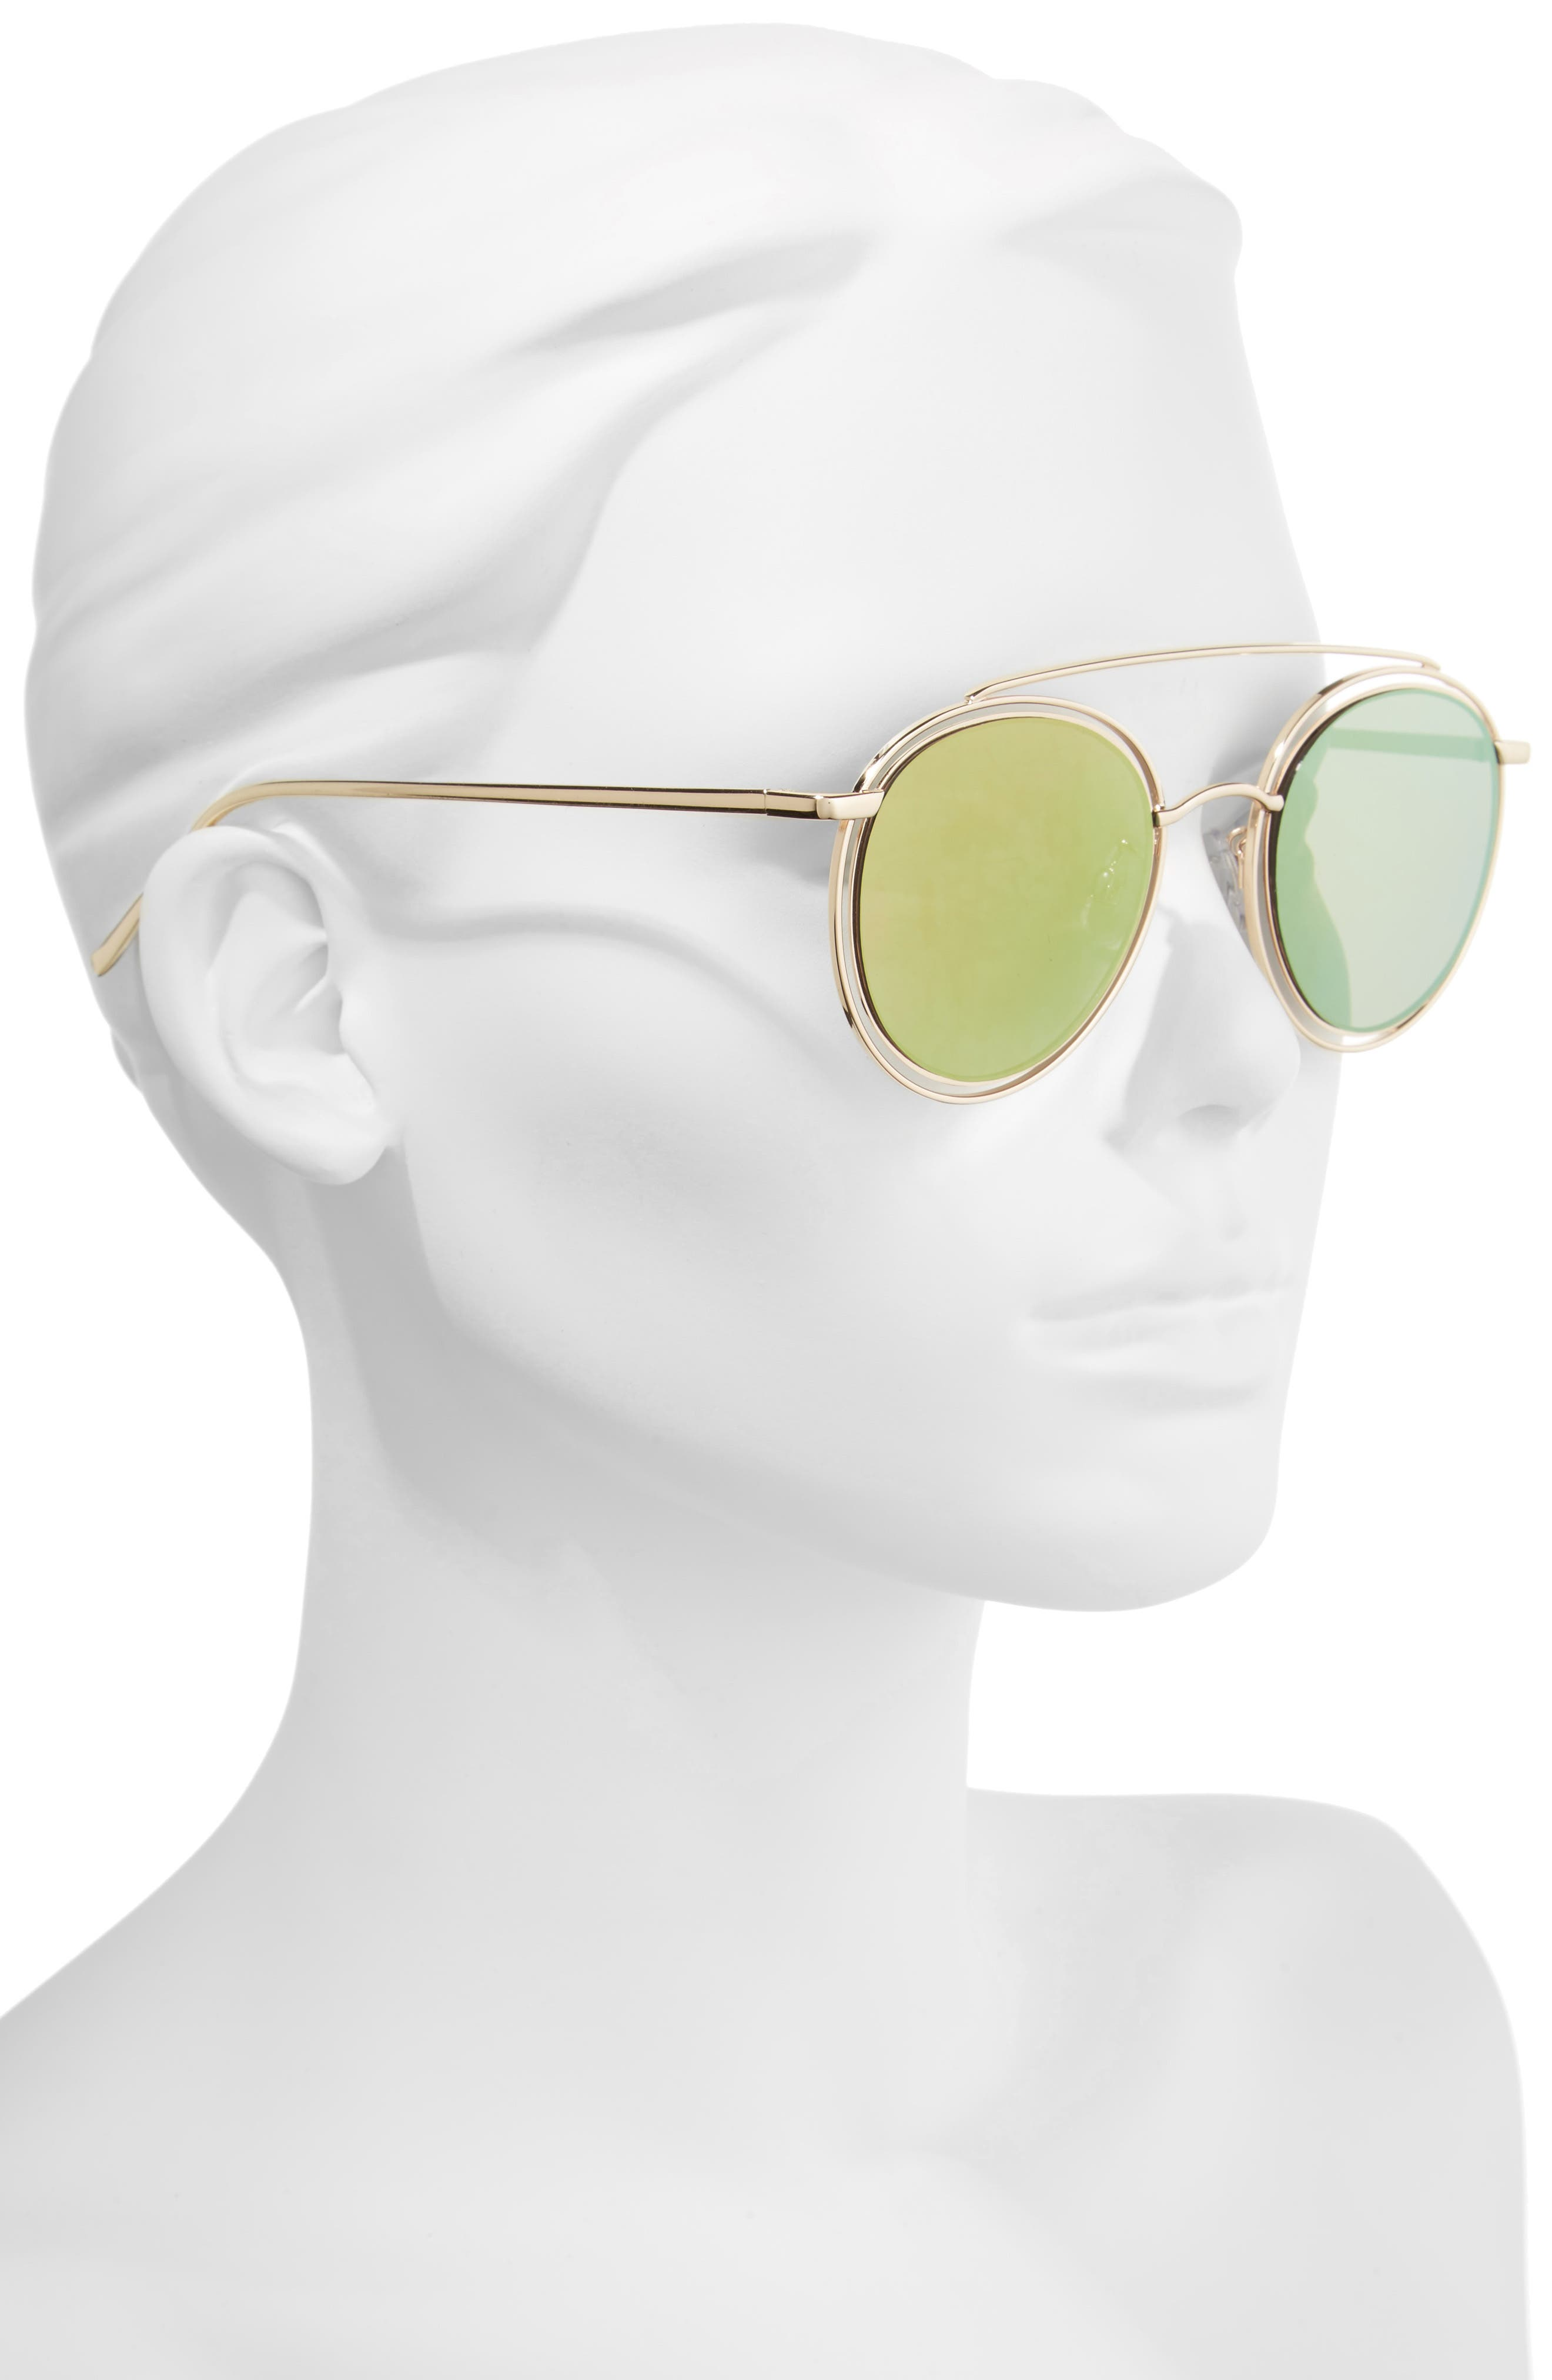 50mm Browbar Sunglasses,                             Alternate thumbnail 2, color,                             Gold/ Pink